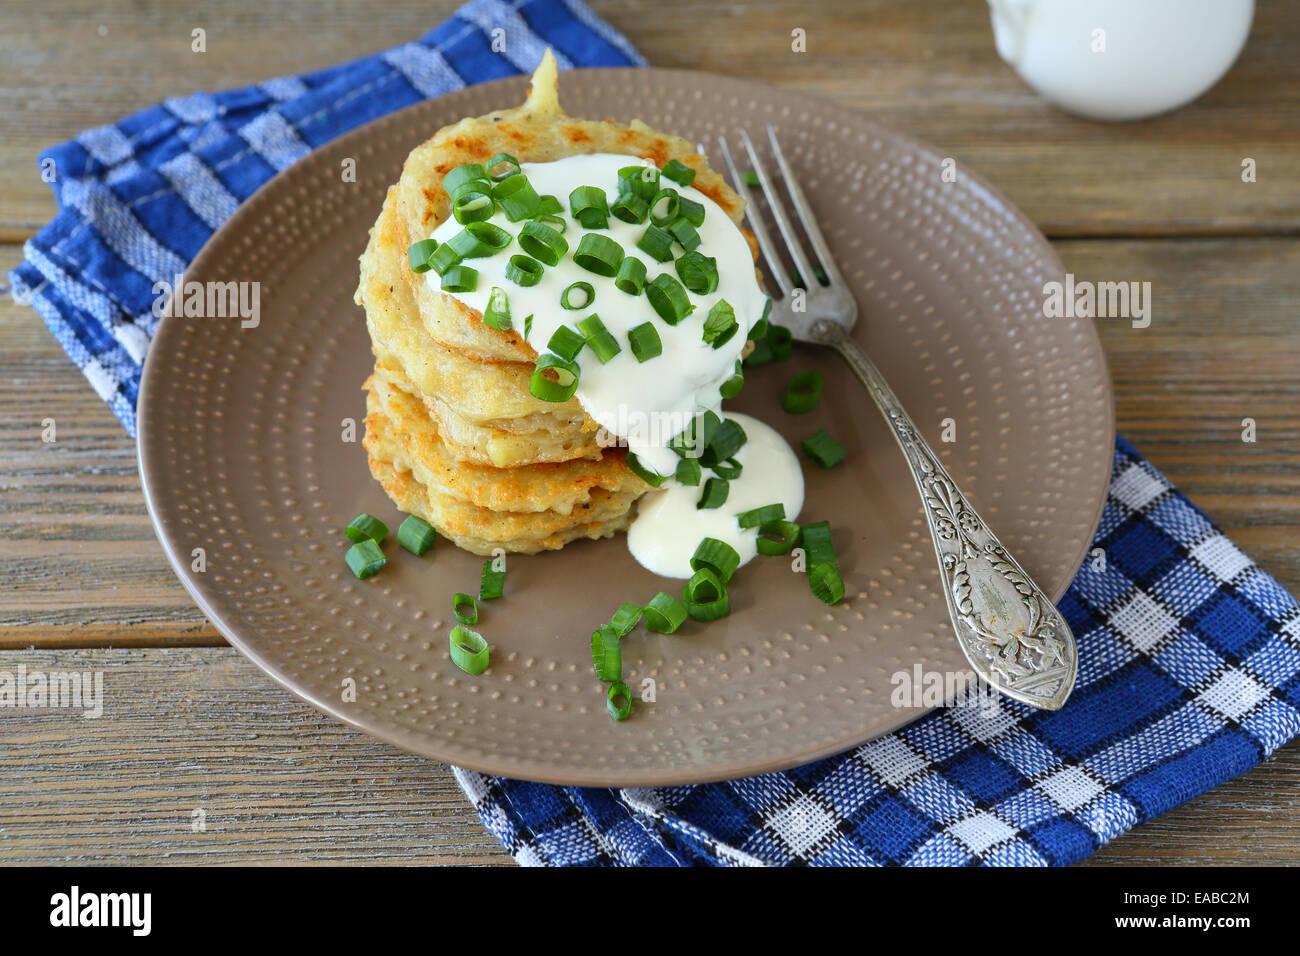 Stack of Potato pancakes on a plate, on napkin - Stock Image